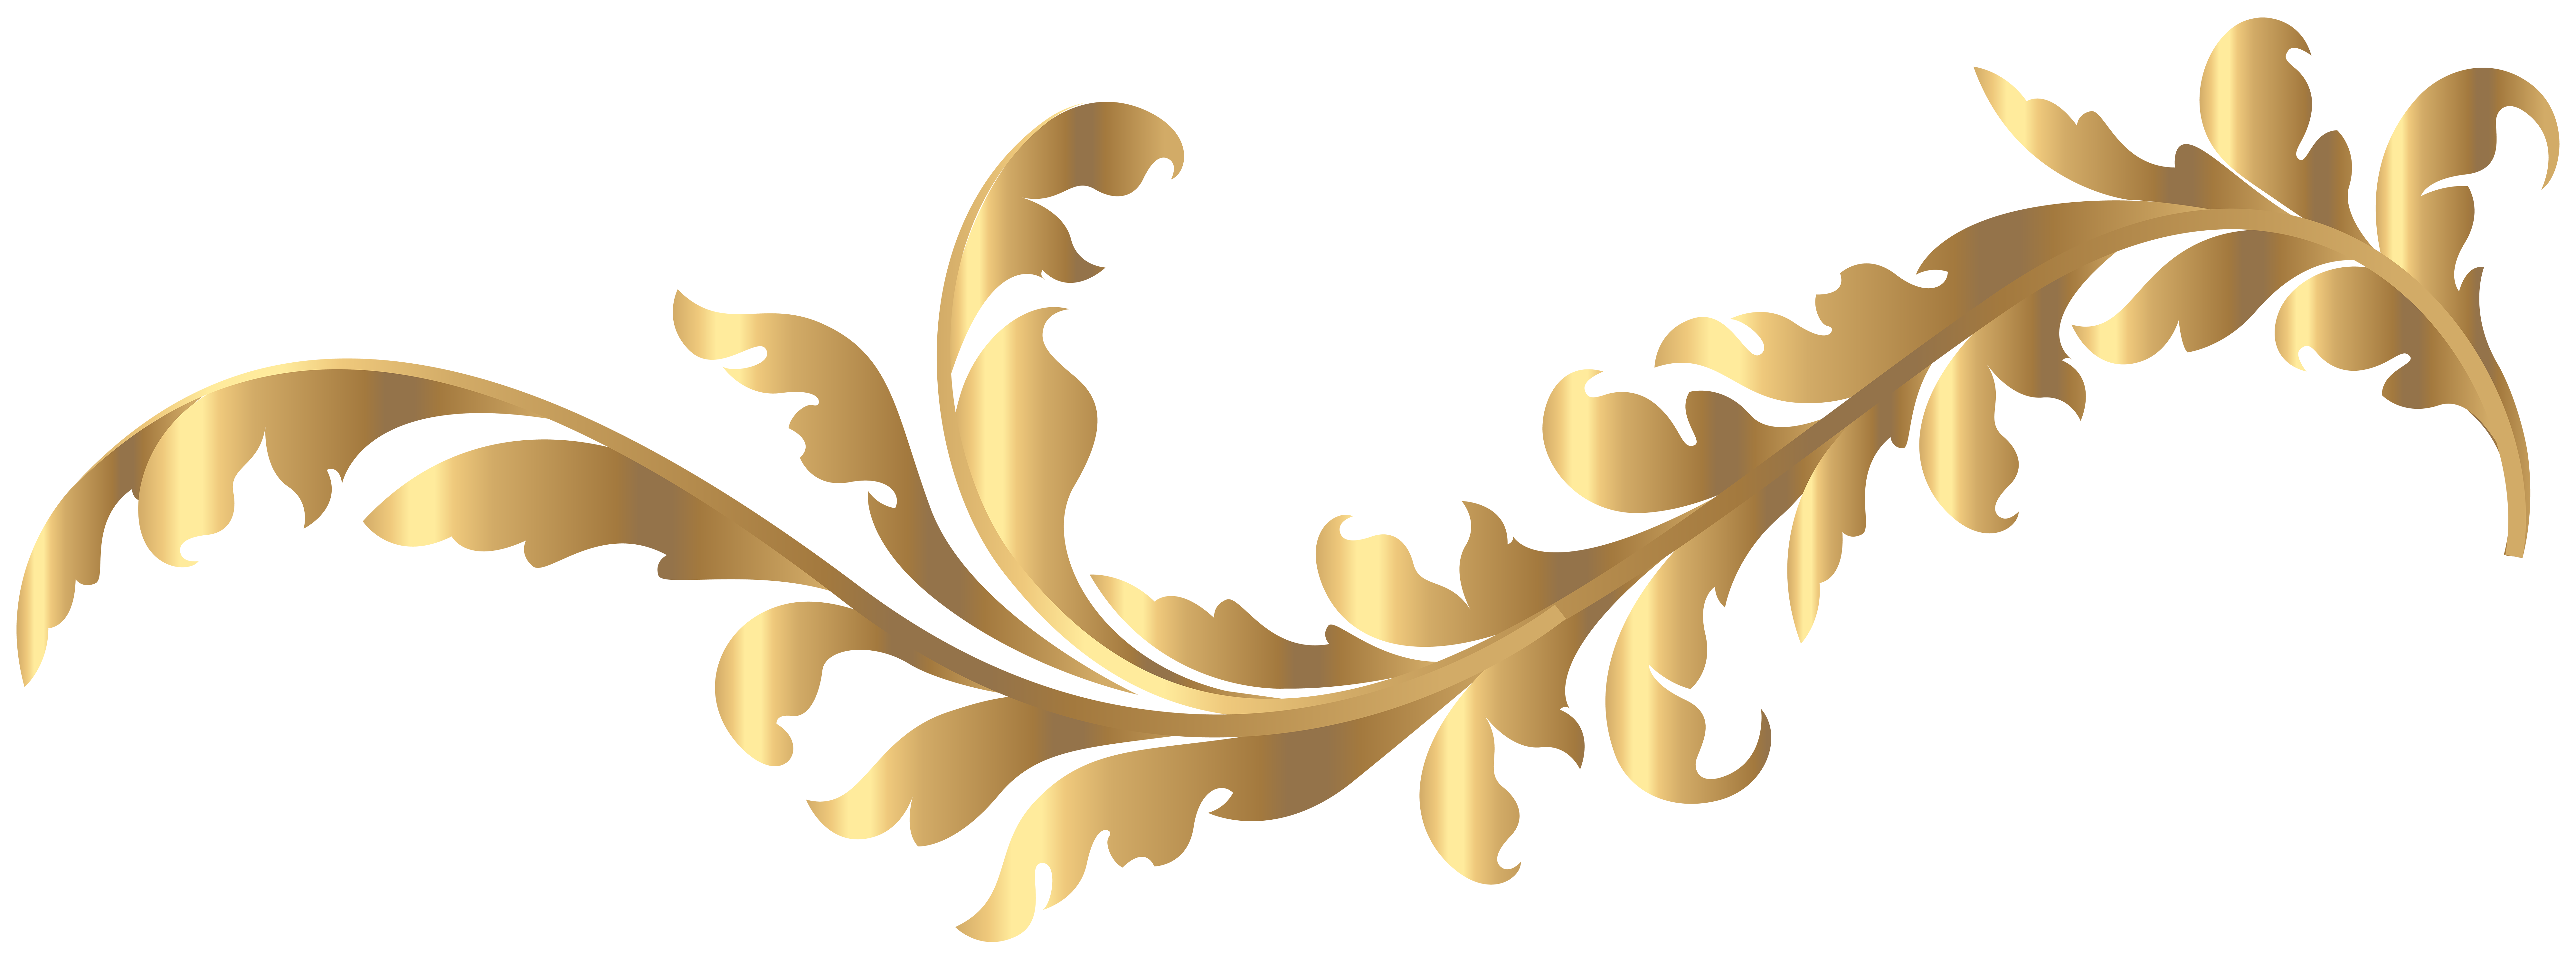 Floral Gold Element PNG Clip Art Image.